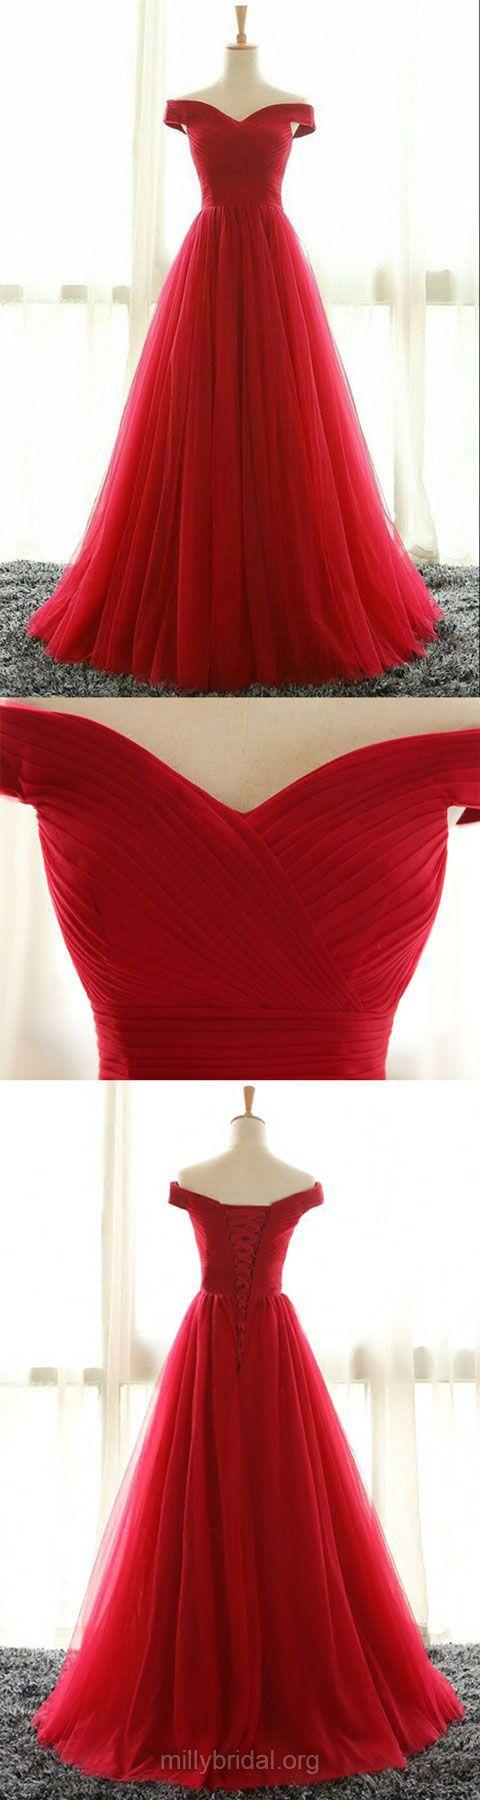 Red prom dresses long prom dresses prom dresses princess off